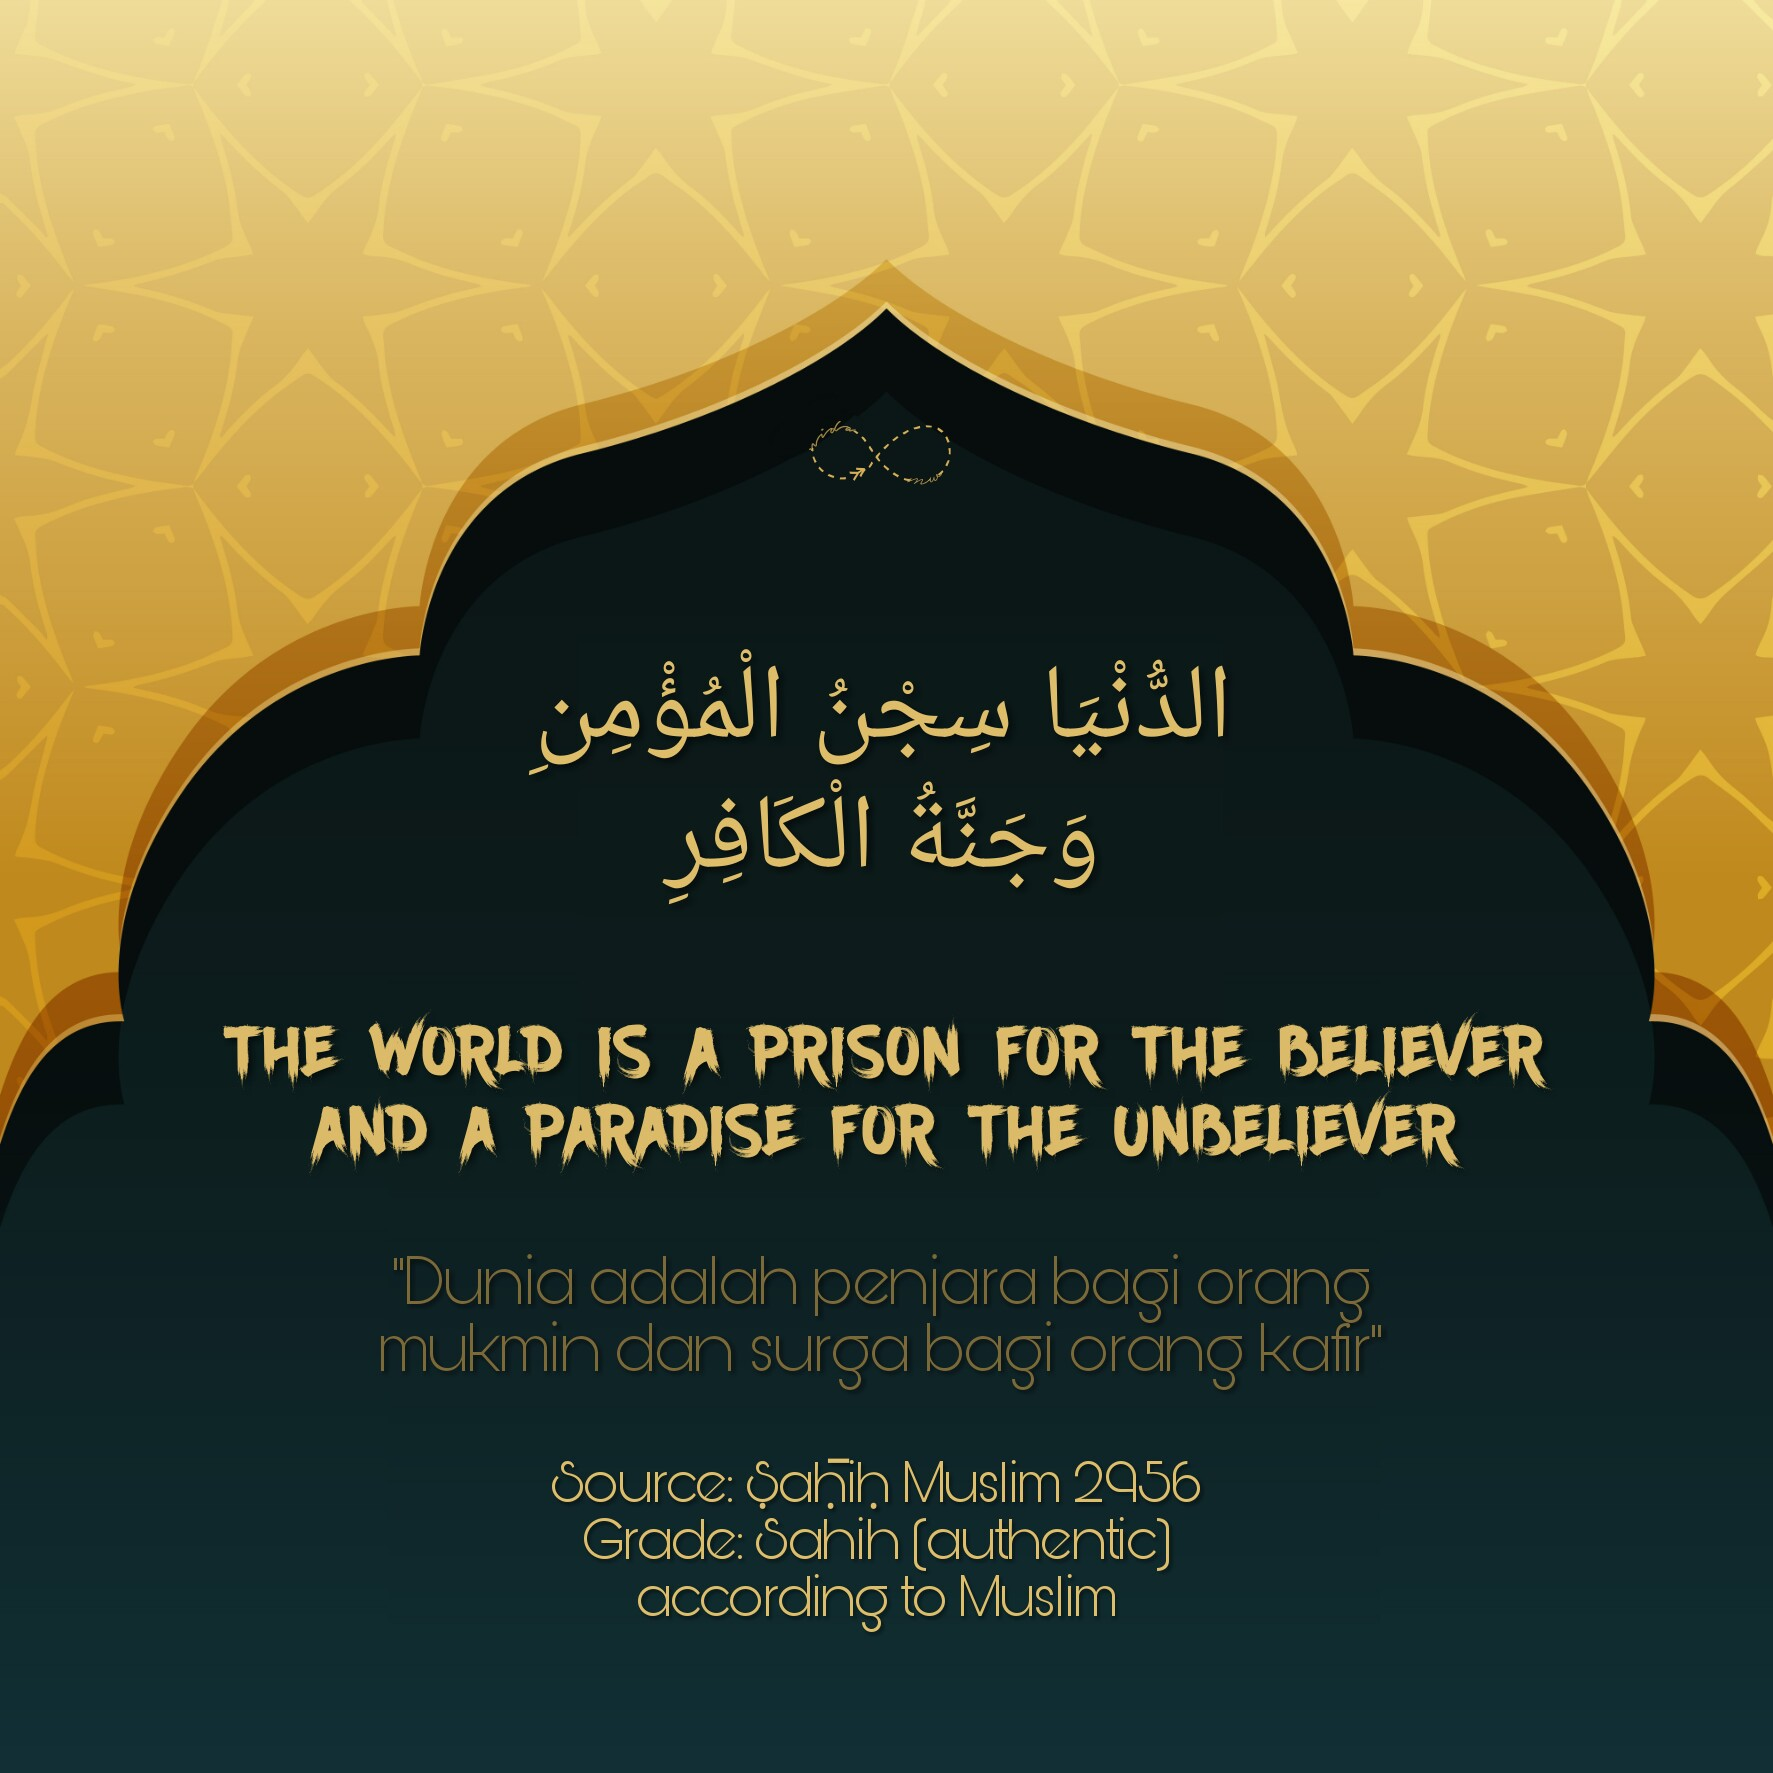 islamic quotes quote islam muslim nasihat nasehat hijra